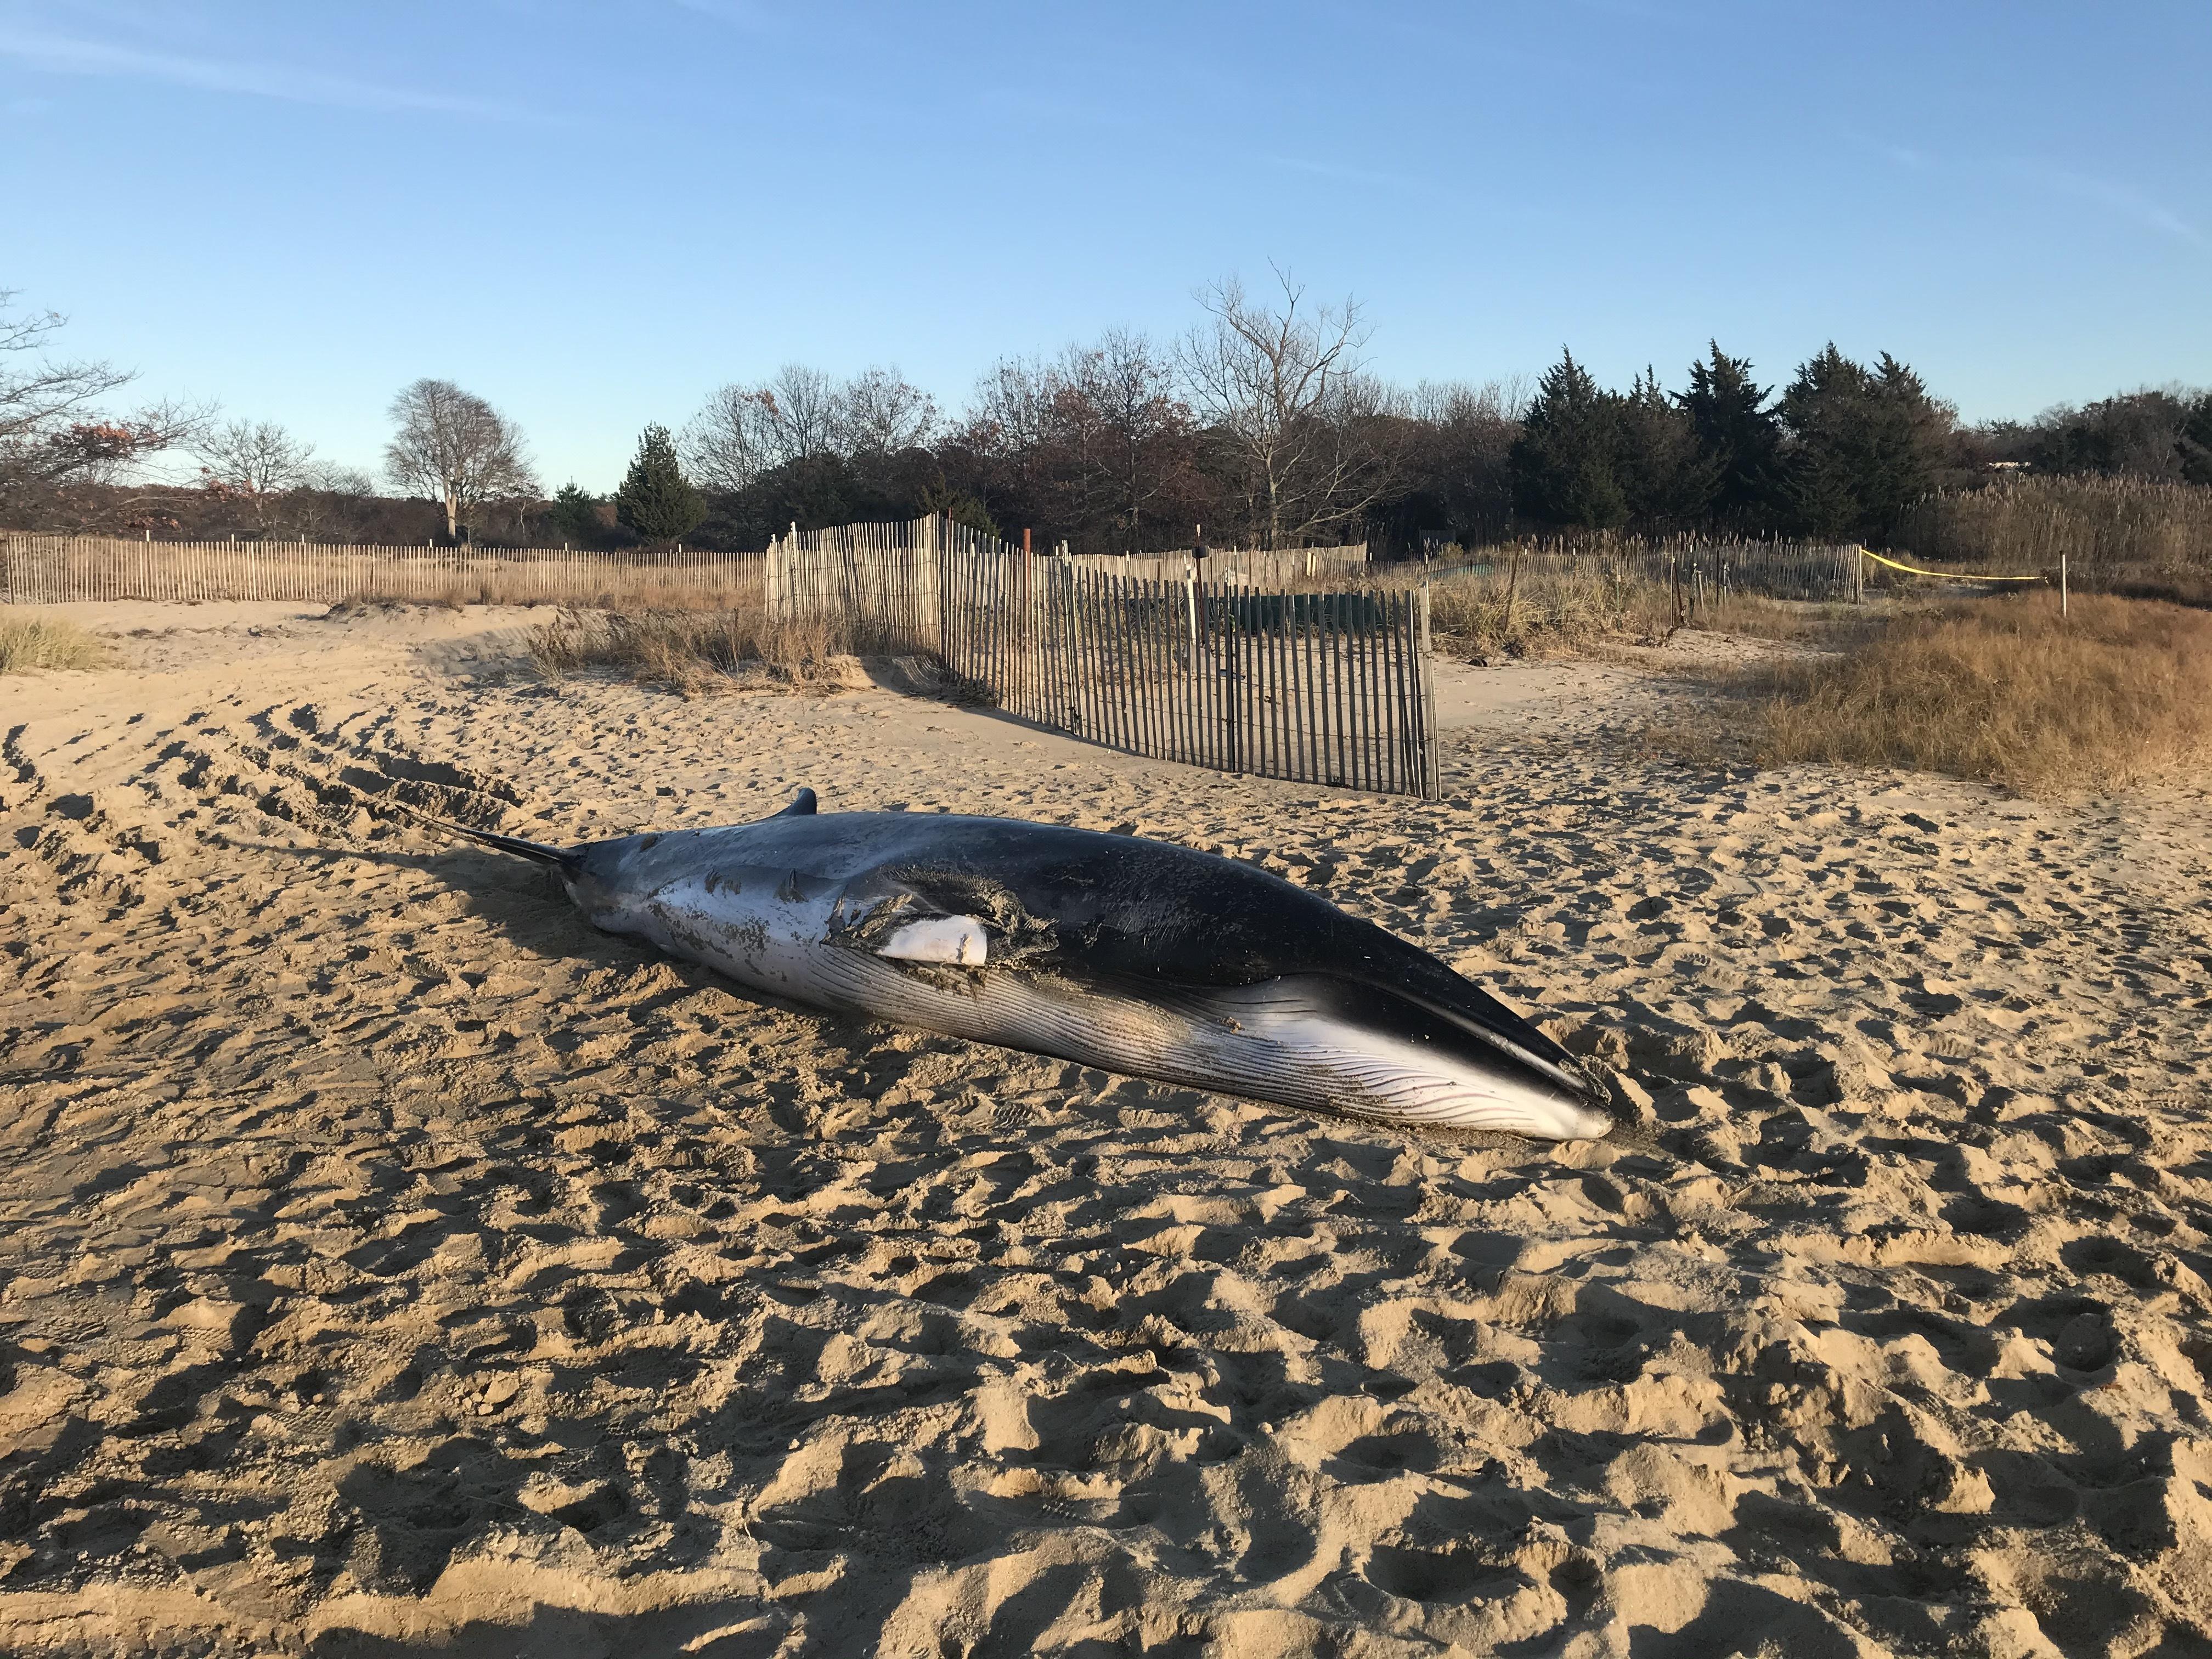 A female minke whale, 16-feet in length, washed up in Northwest Creek on Thursday.  ELIZABETH VESPE